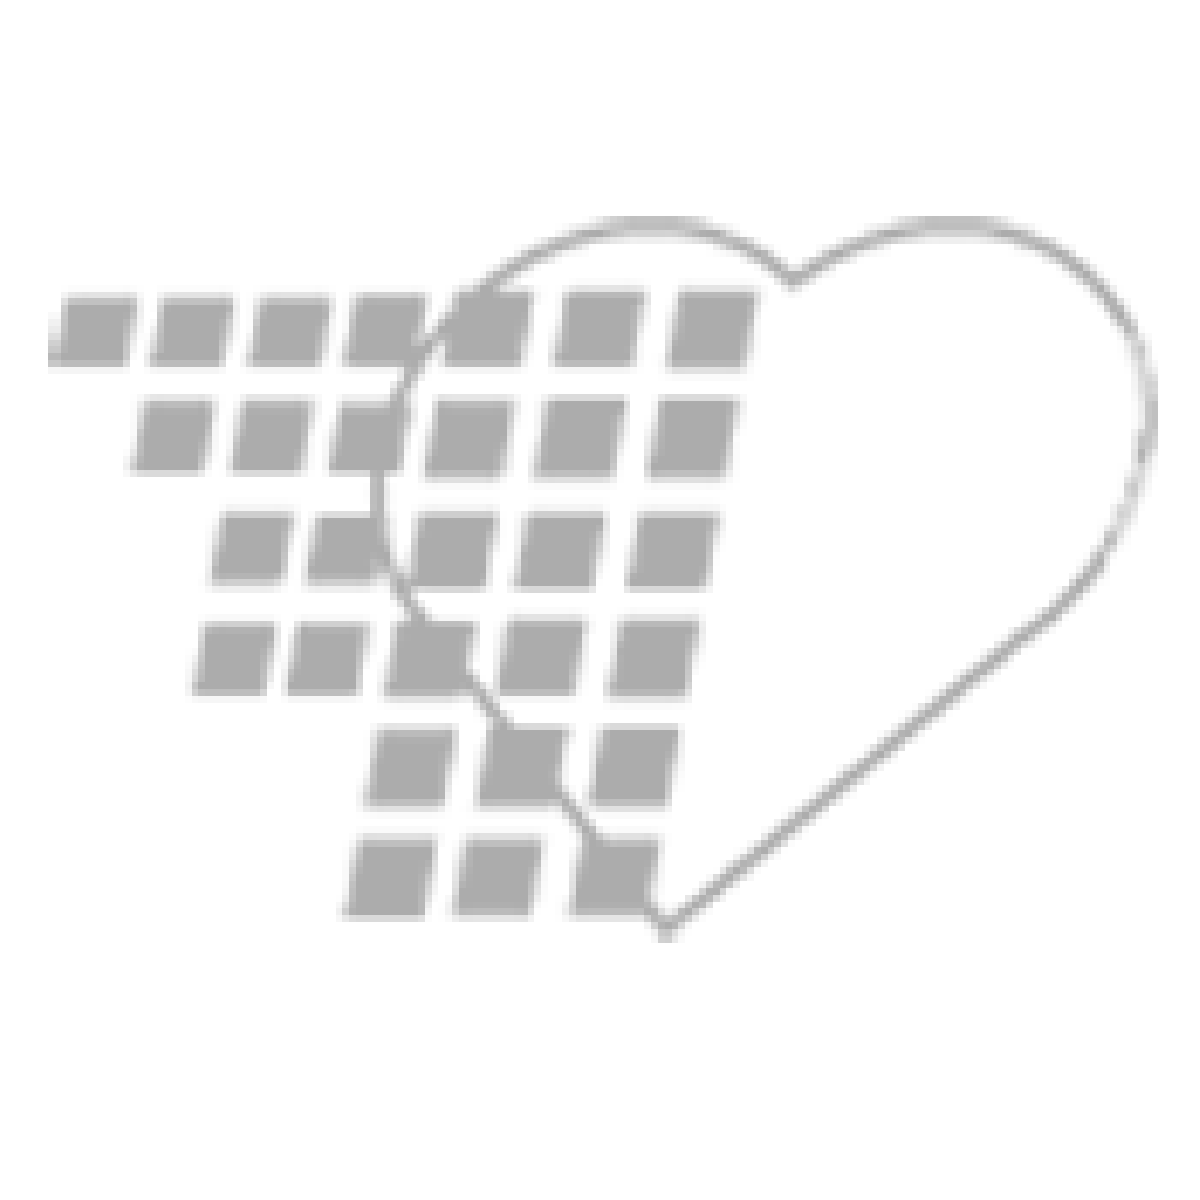 06-93-1135 - Demo Dose® Dextros 25% 10mL